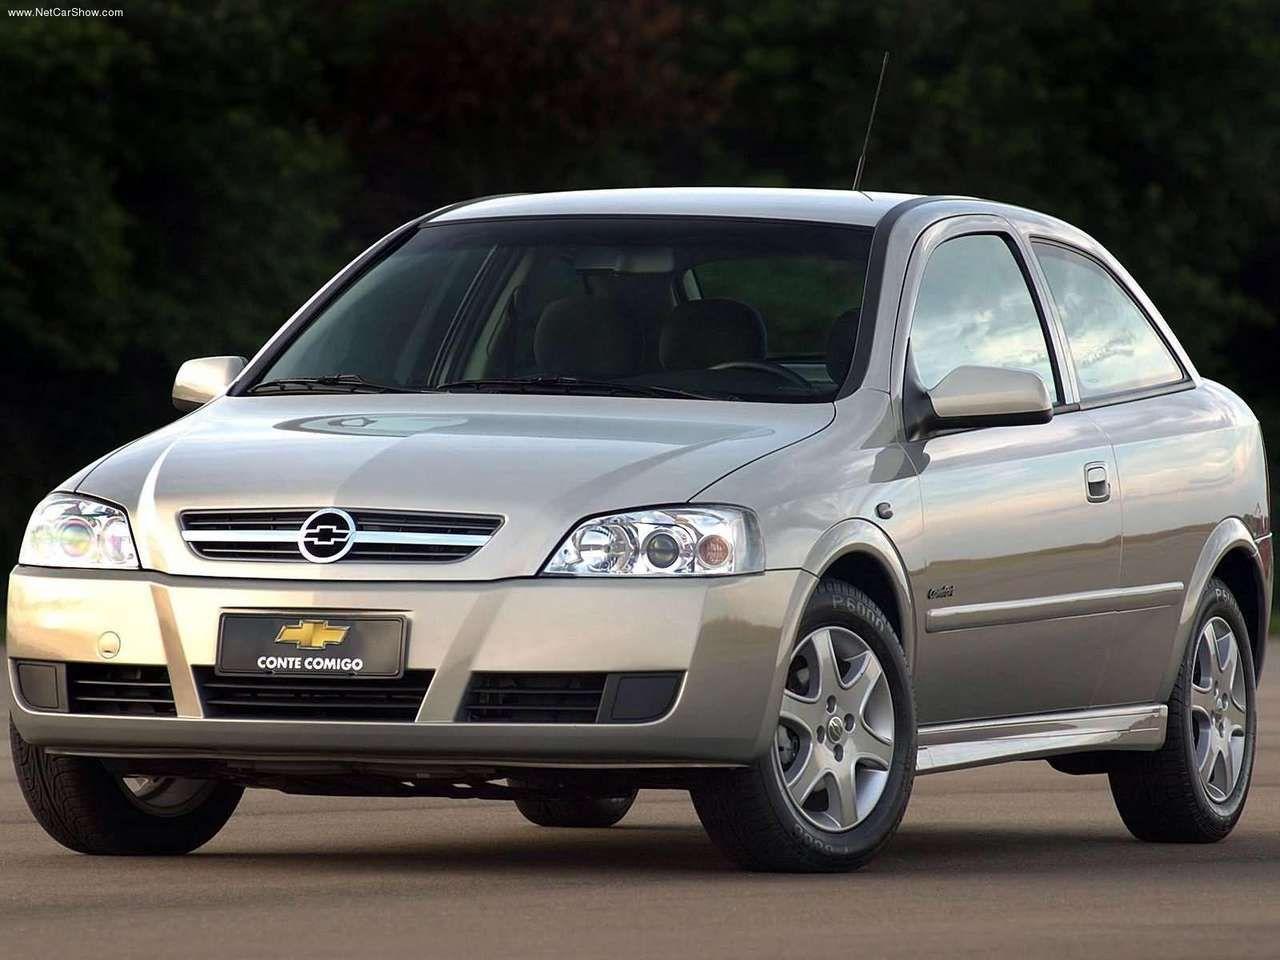 2005 Chevrolet Astra 2 0 Flexpower Comfort Alternador Bosch